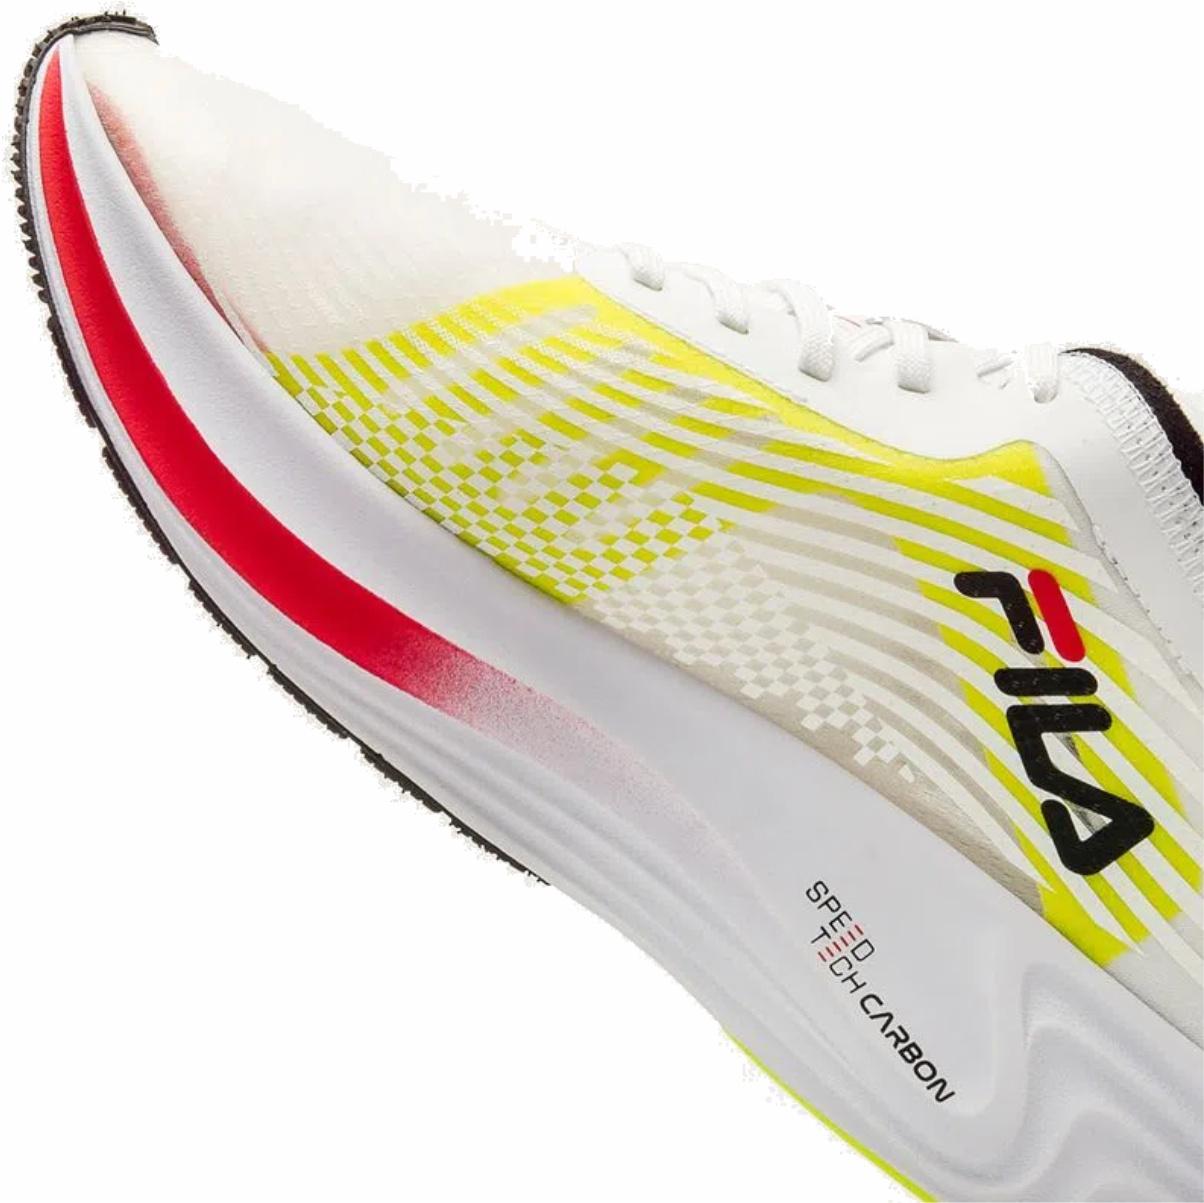 Tenis Fila Racer Carbon Speed Tech Masculino Running Performance